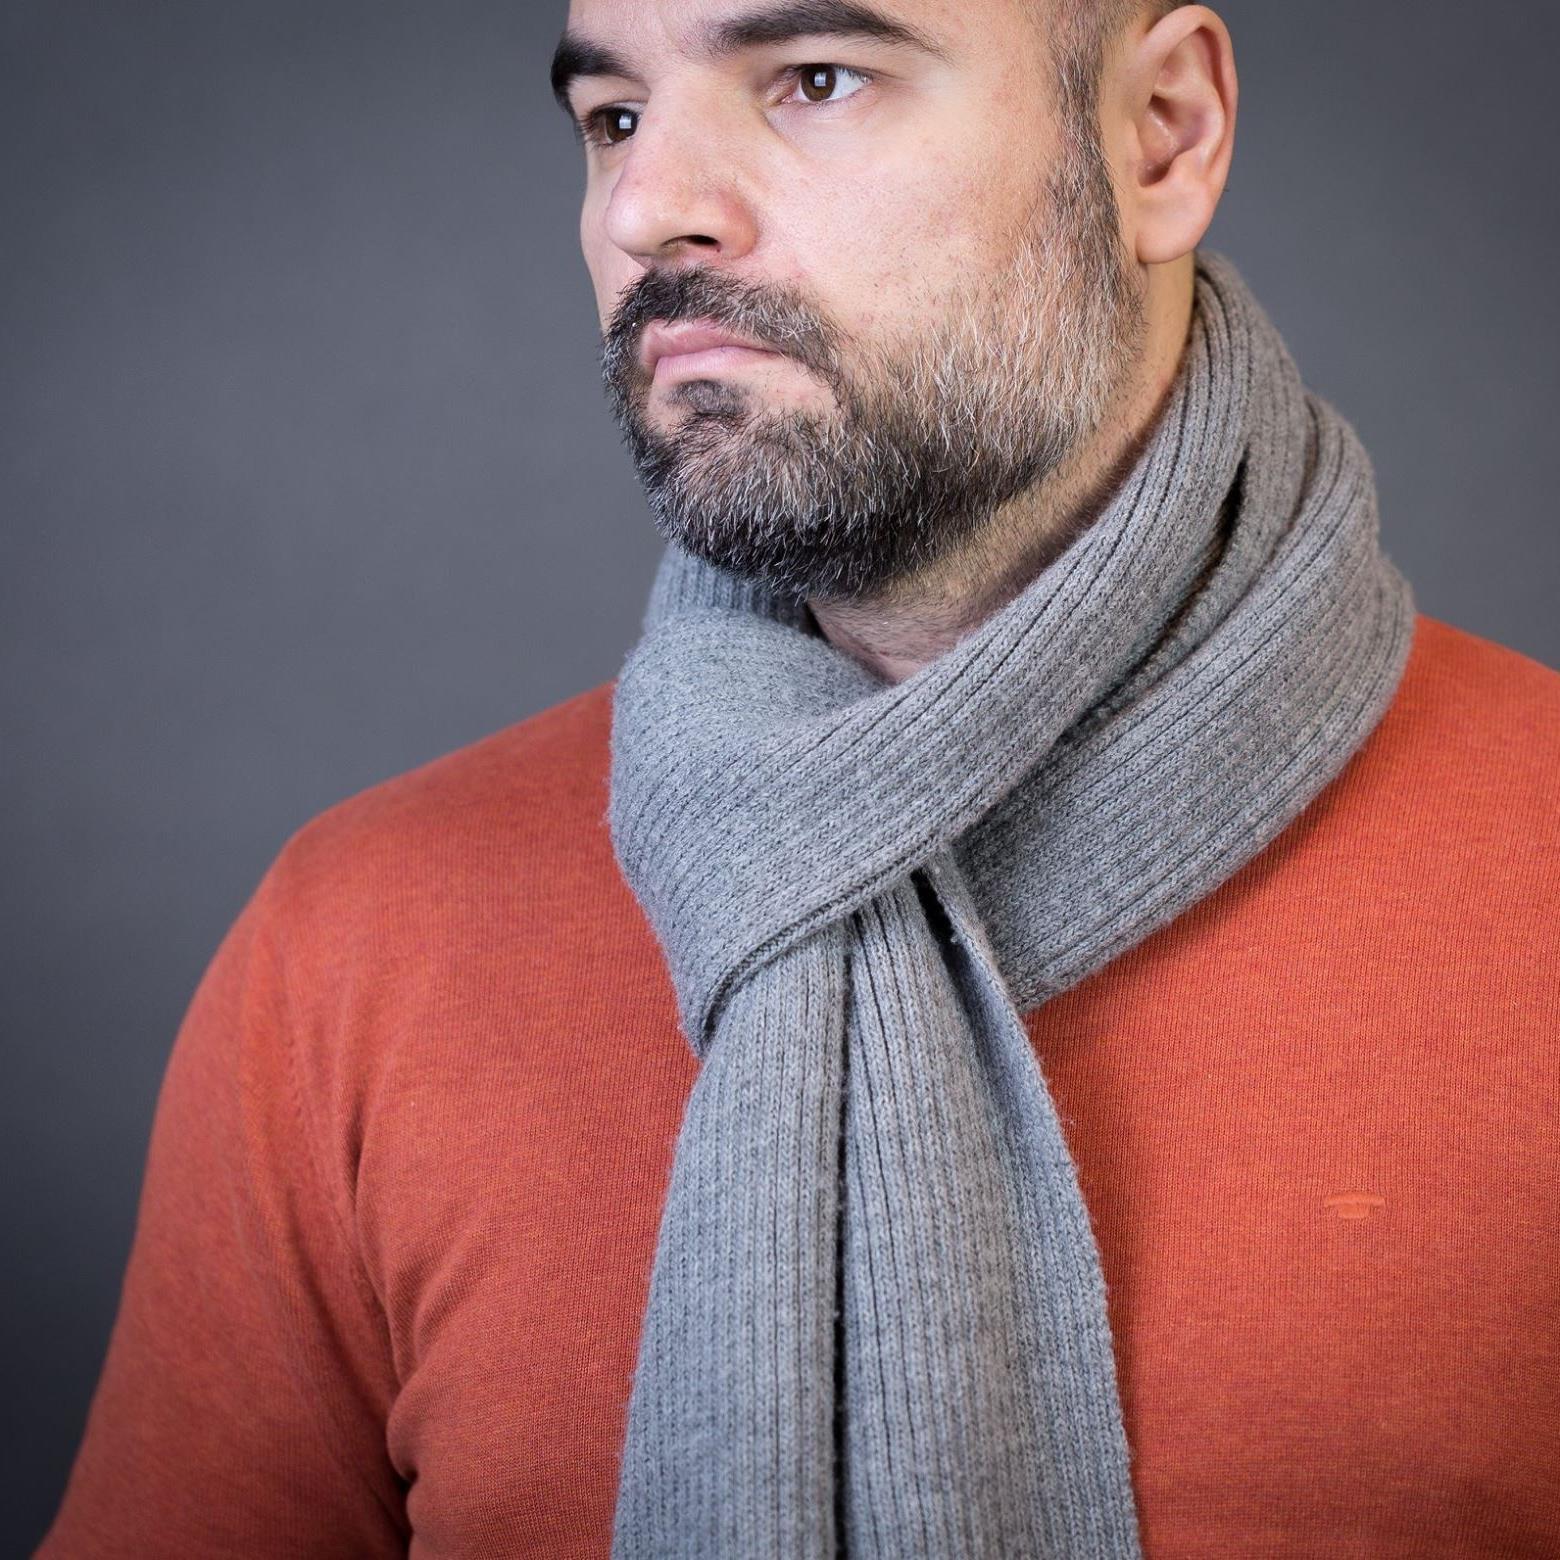 Go to Nikola Knezevic's profile